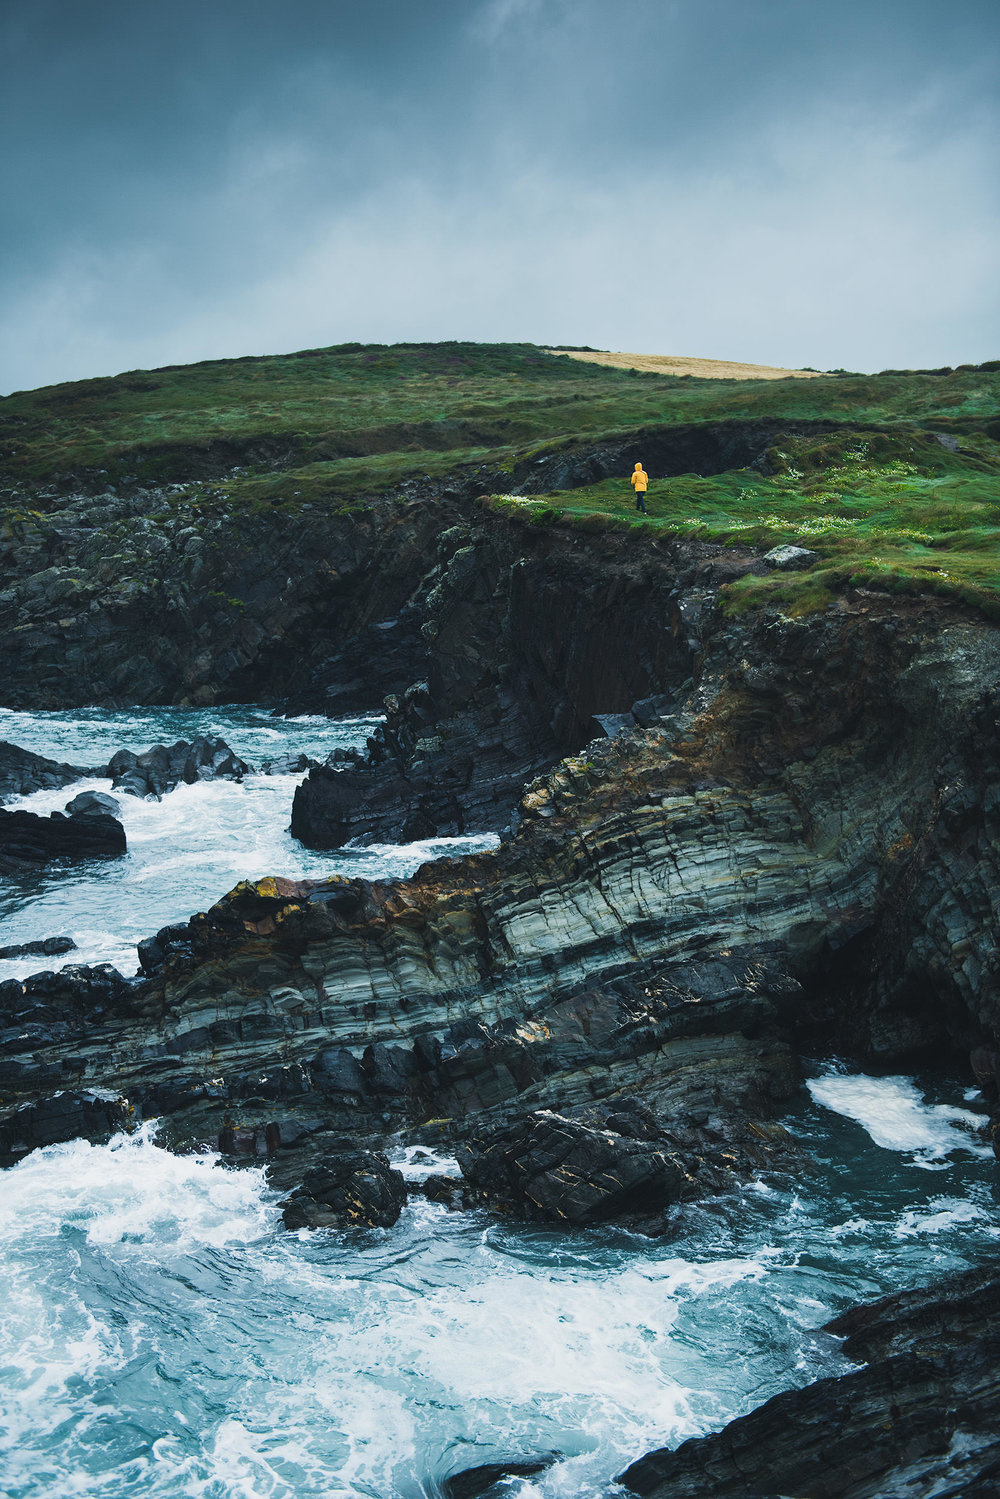 15a-outdoor-ireland-coast-adventure-wandering-cliffs.jpg